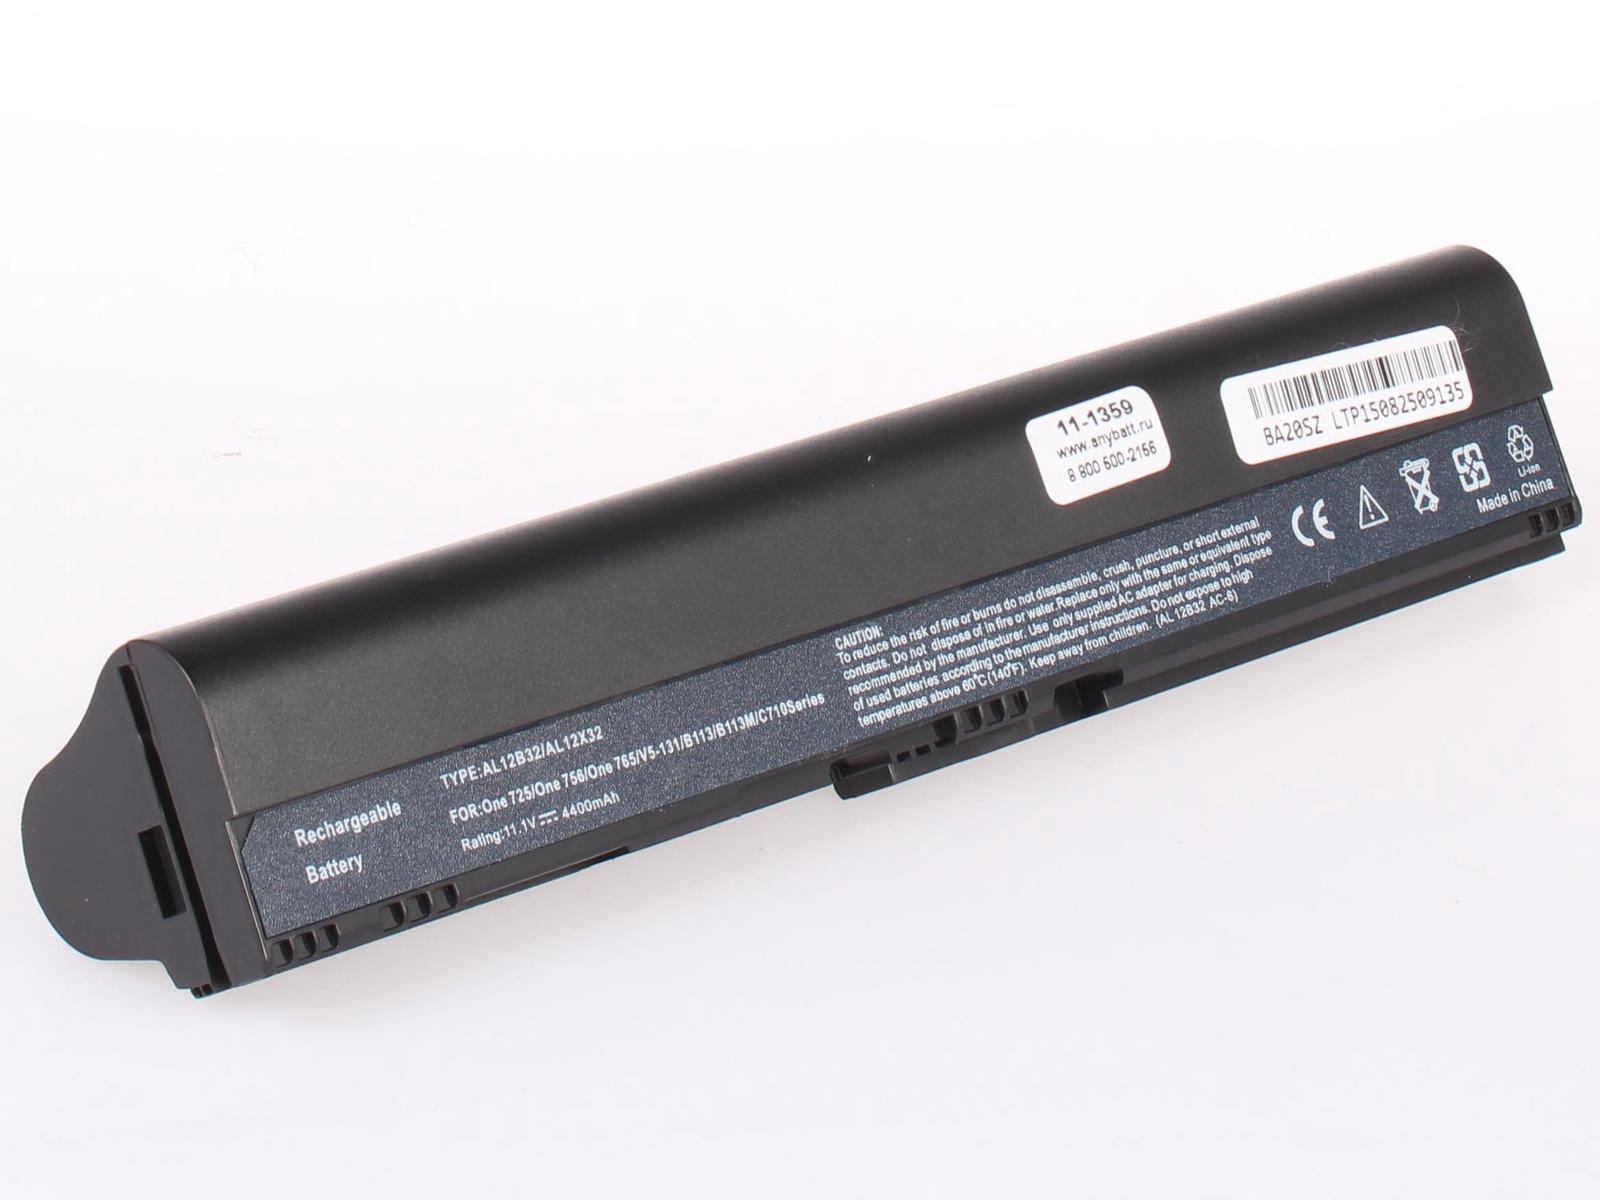 Аккумулятор для ноутбука AnyBatt Acer AL12B32, AL12X32, AL12B31 не заряжается батарея ноутбука